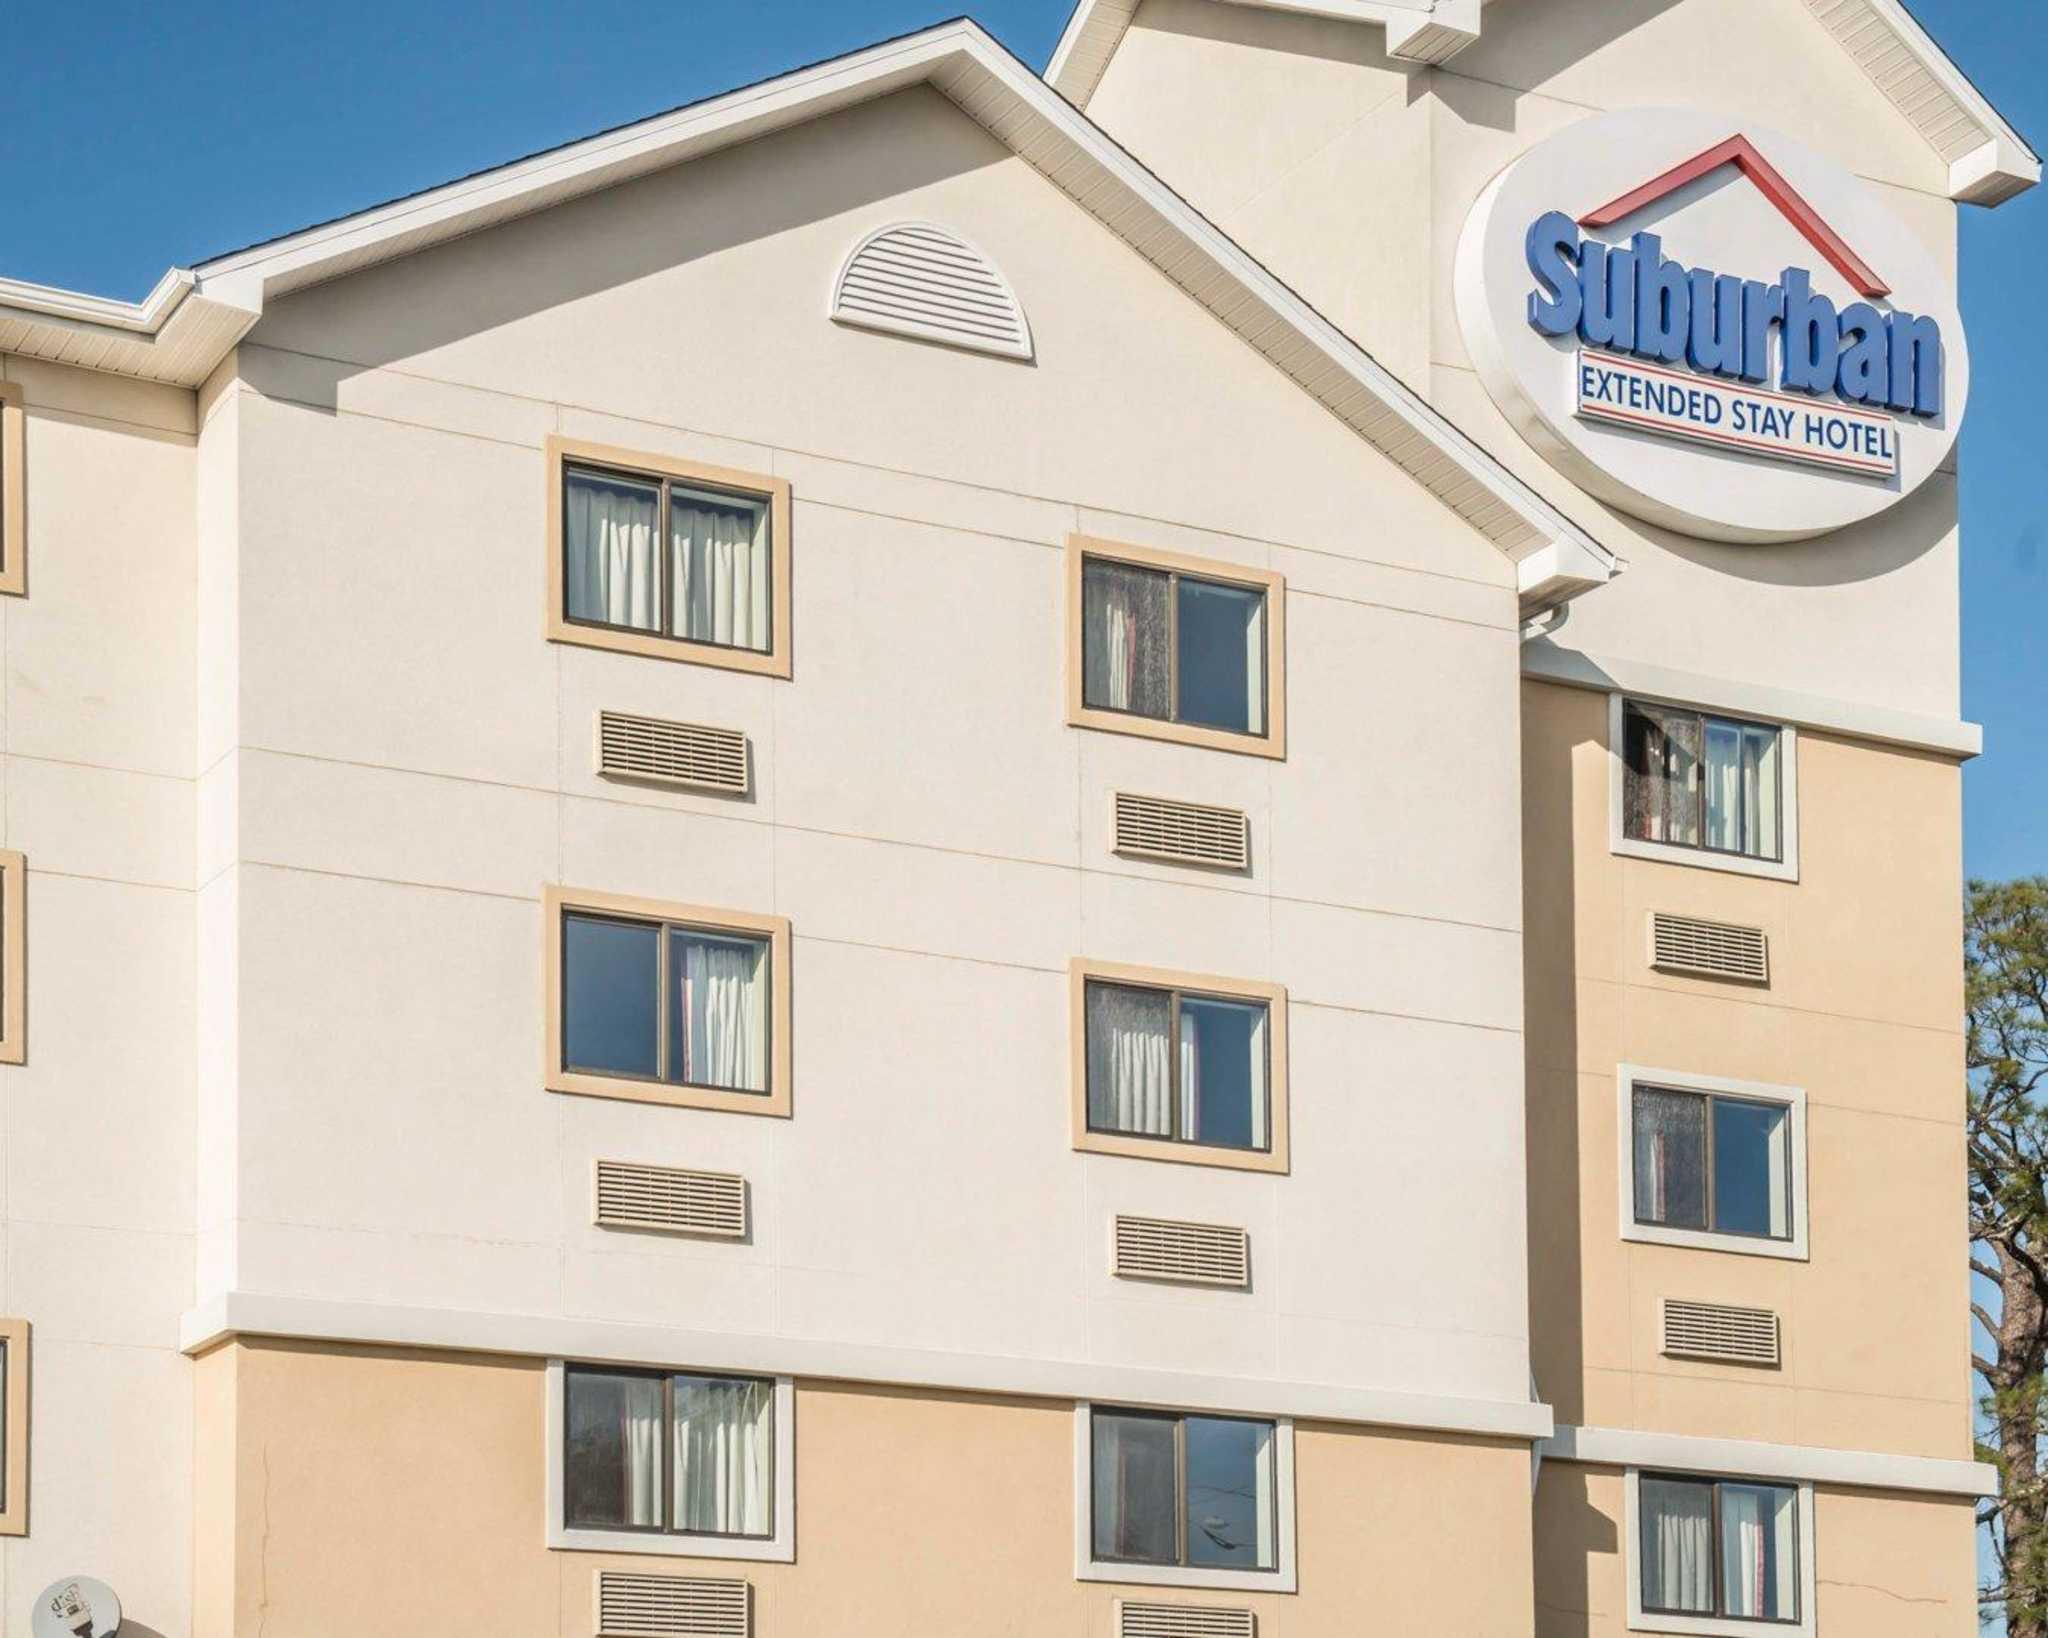 Suburban Extended Stay Hotel  Panama City Florida  Fl